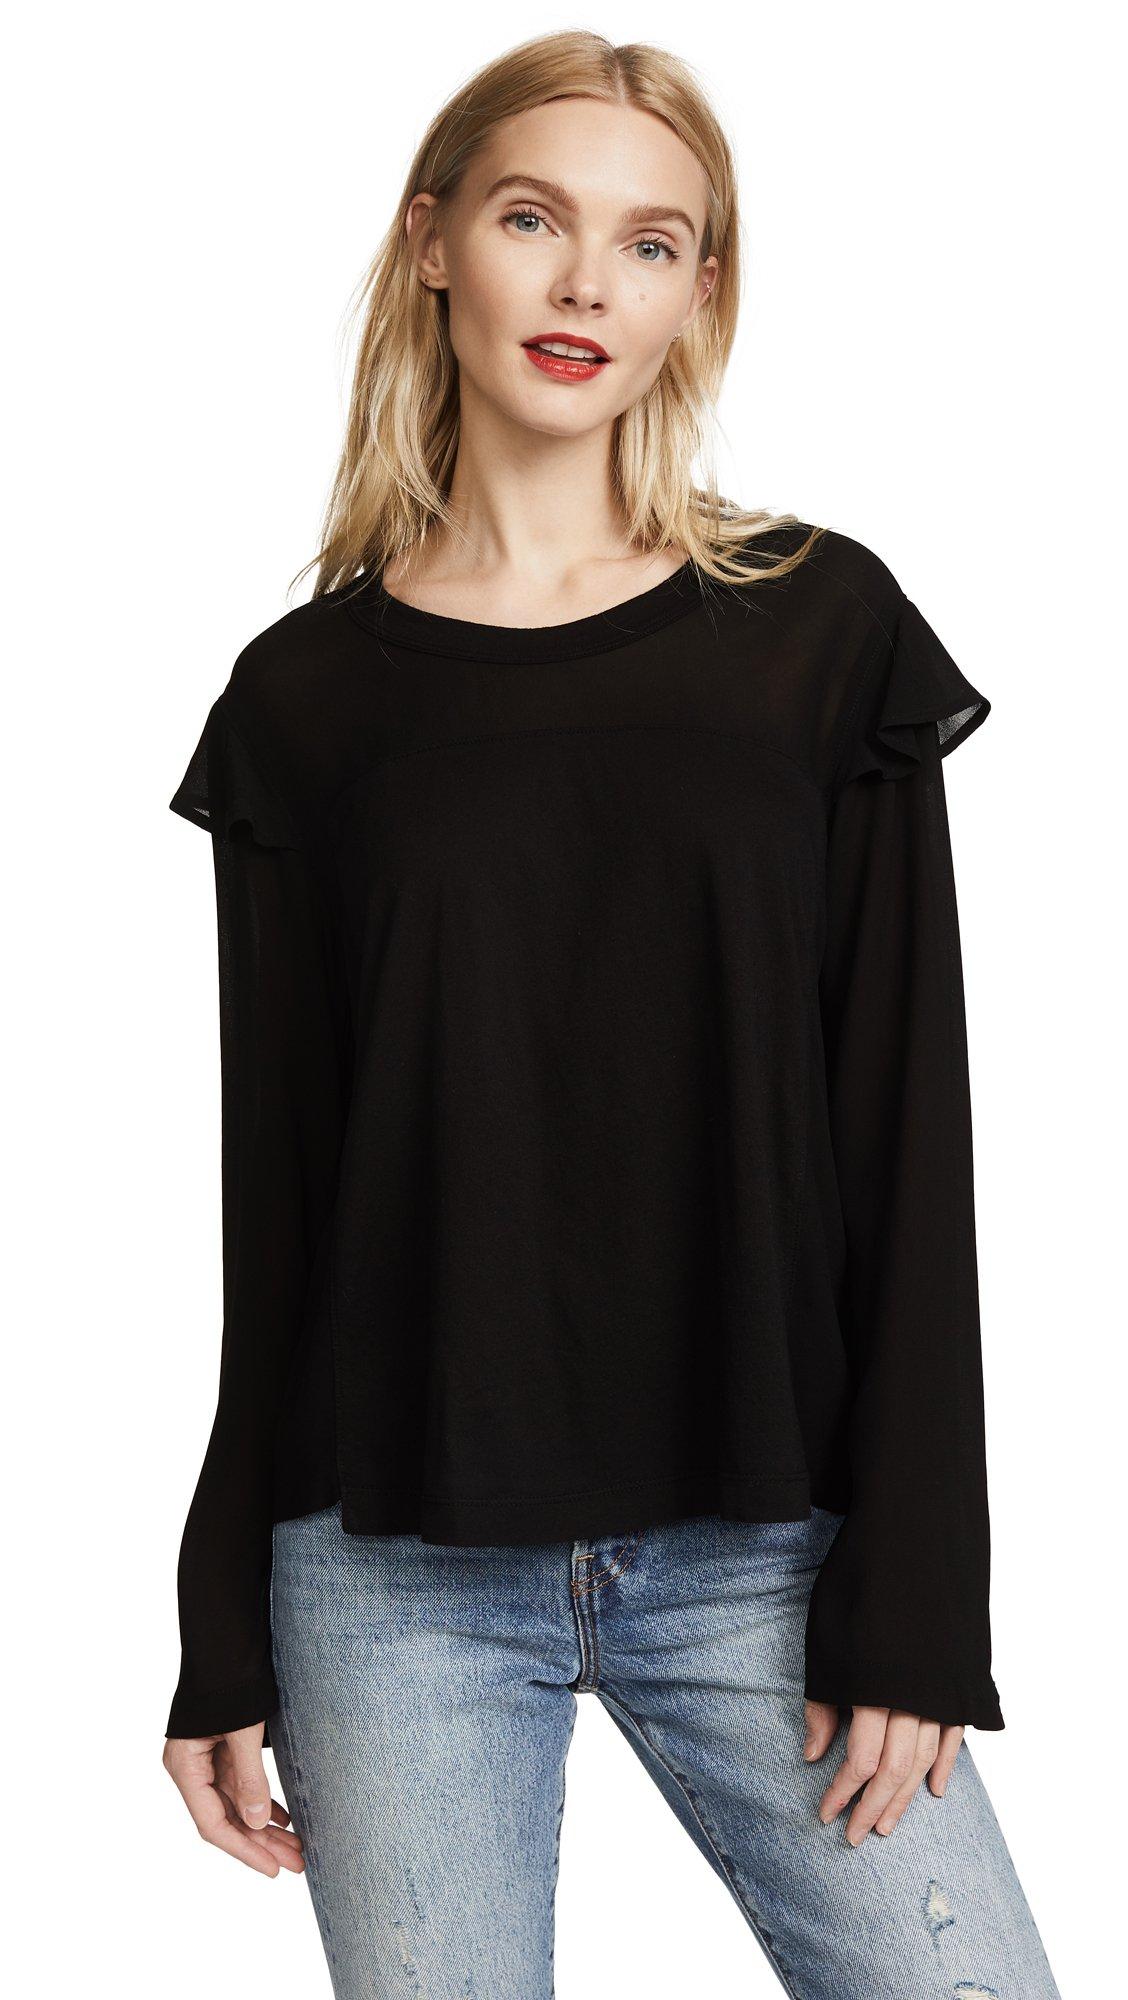 Wilt Women's Georgette Layer Sleeve Tee, Black, X-Small